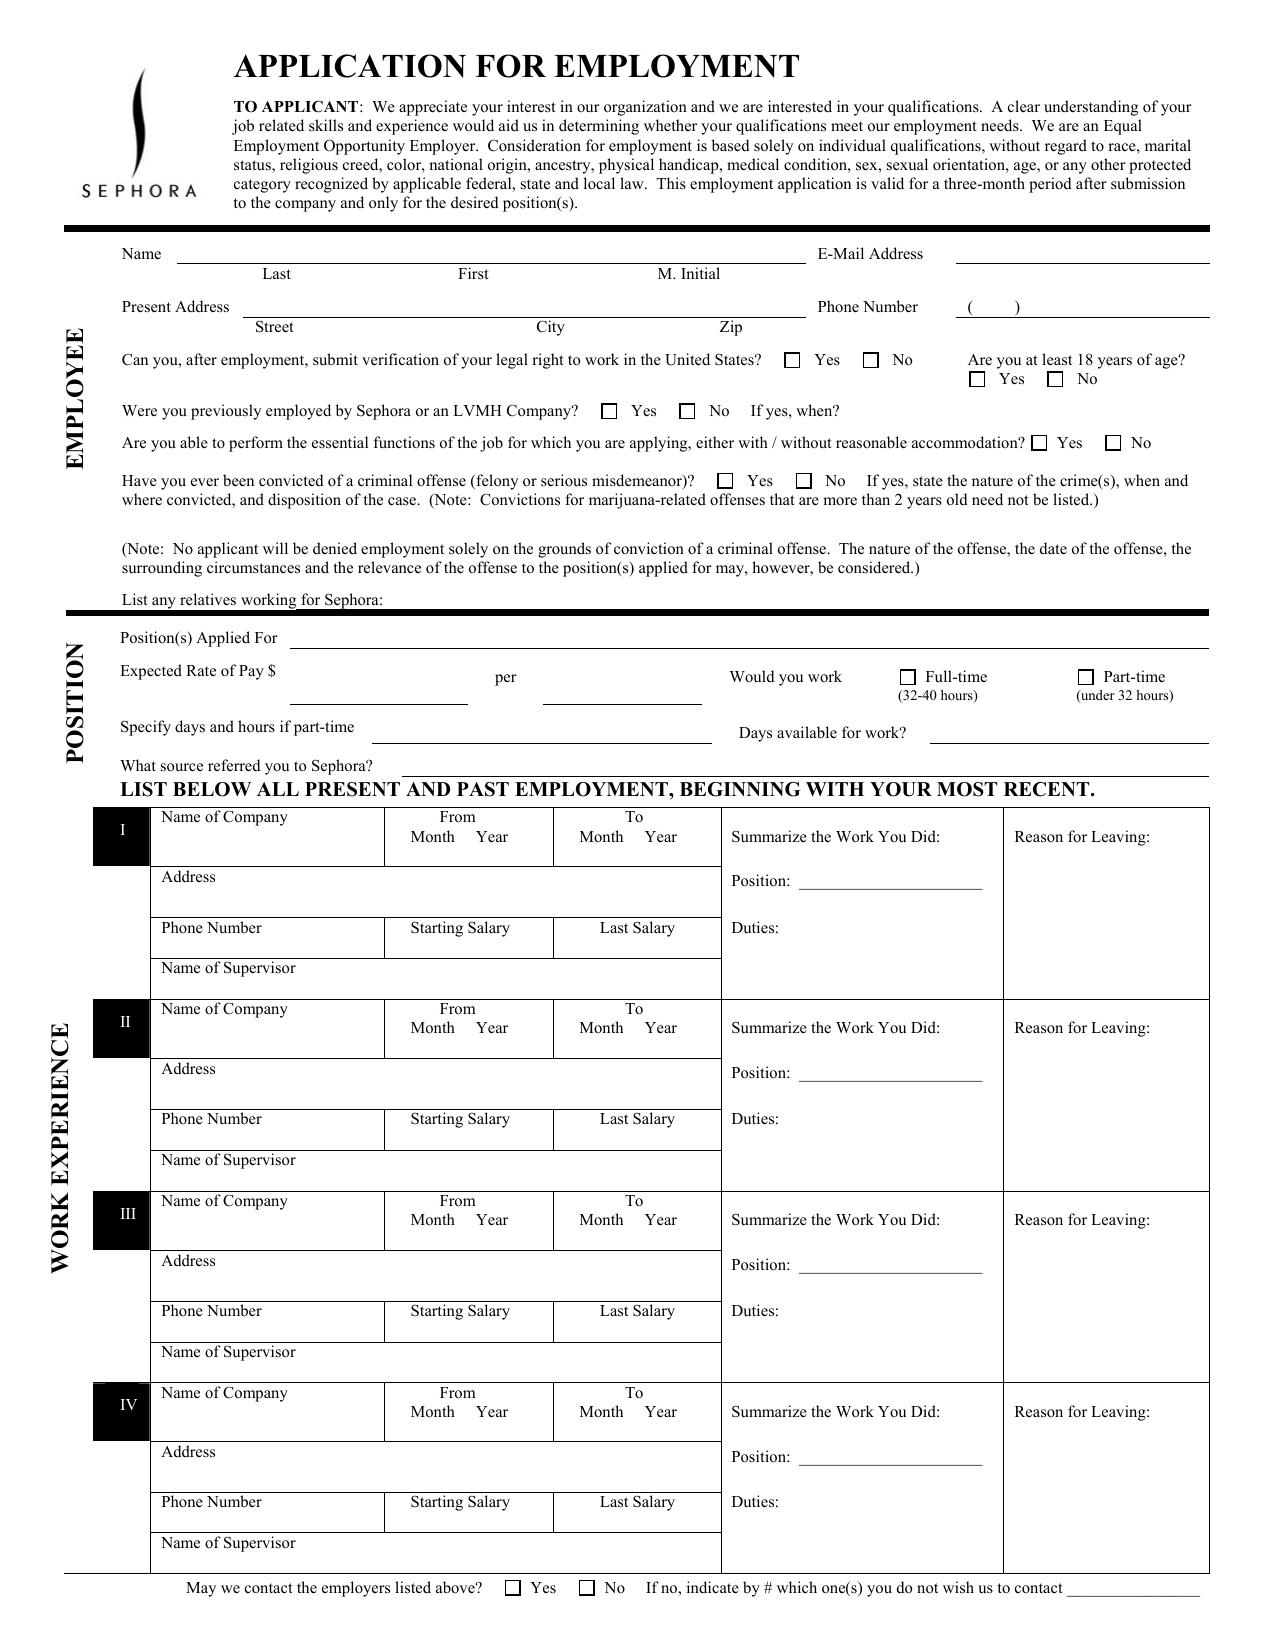 Download Sephora Job Application Form Careers Pdf